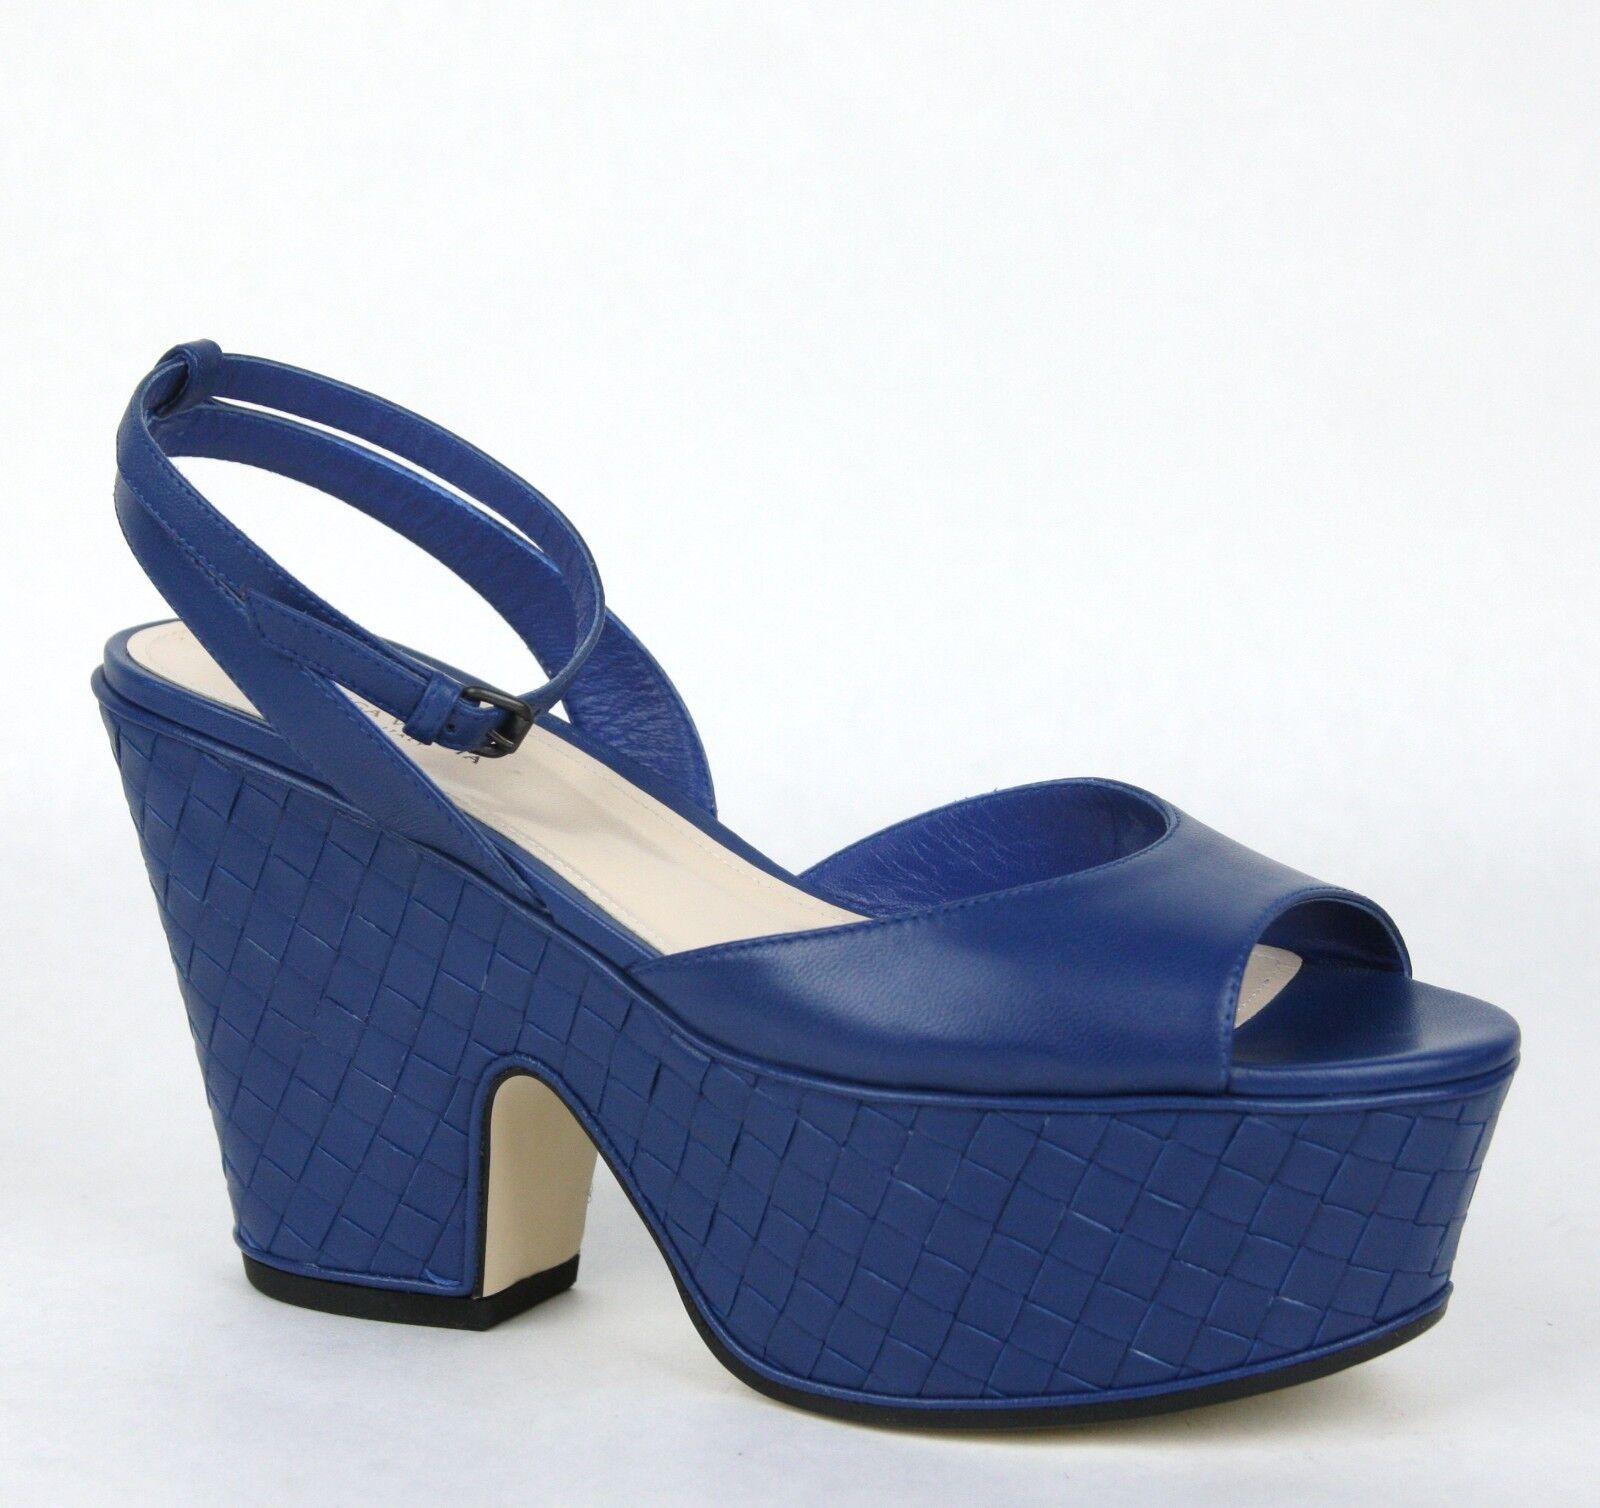 classico senza tempo    640 New Bottega Veneta Woven Leather Platform Wedge Sandal blu 338279 4217  perfezionare